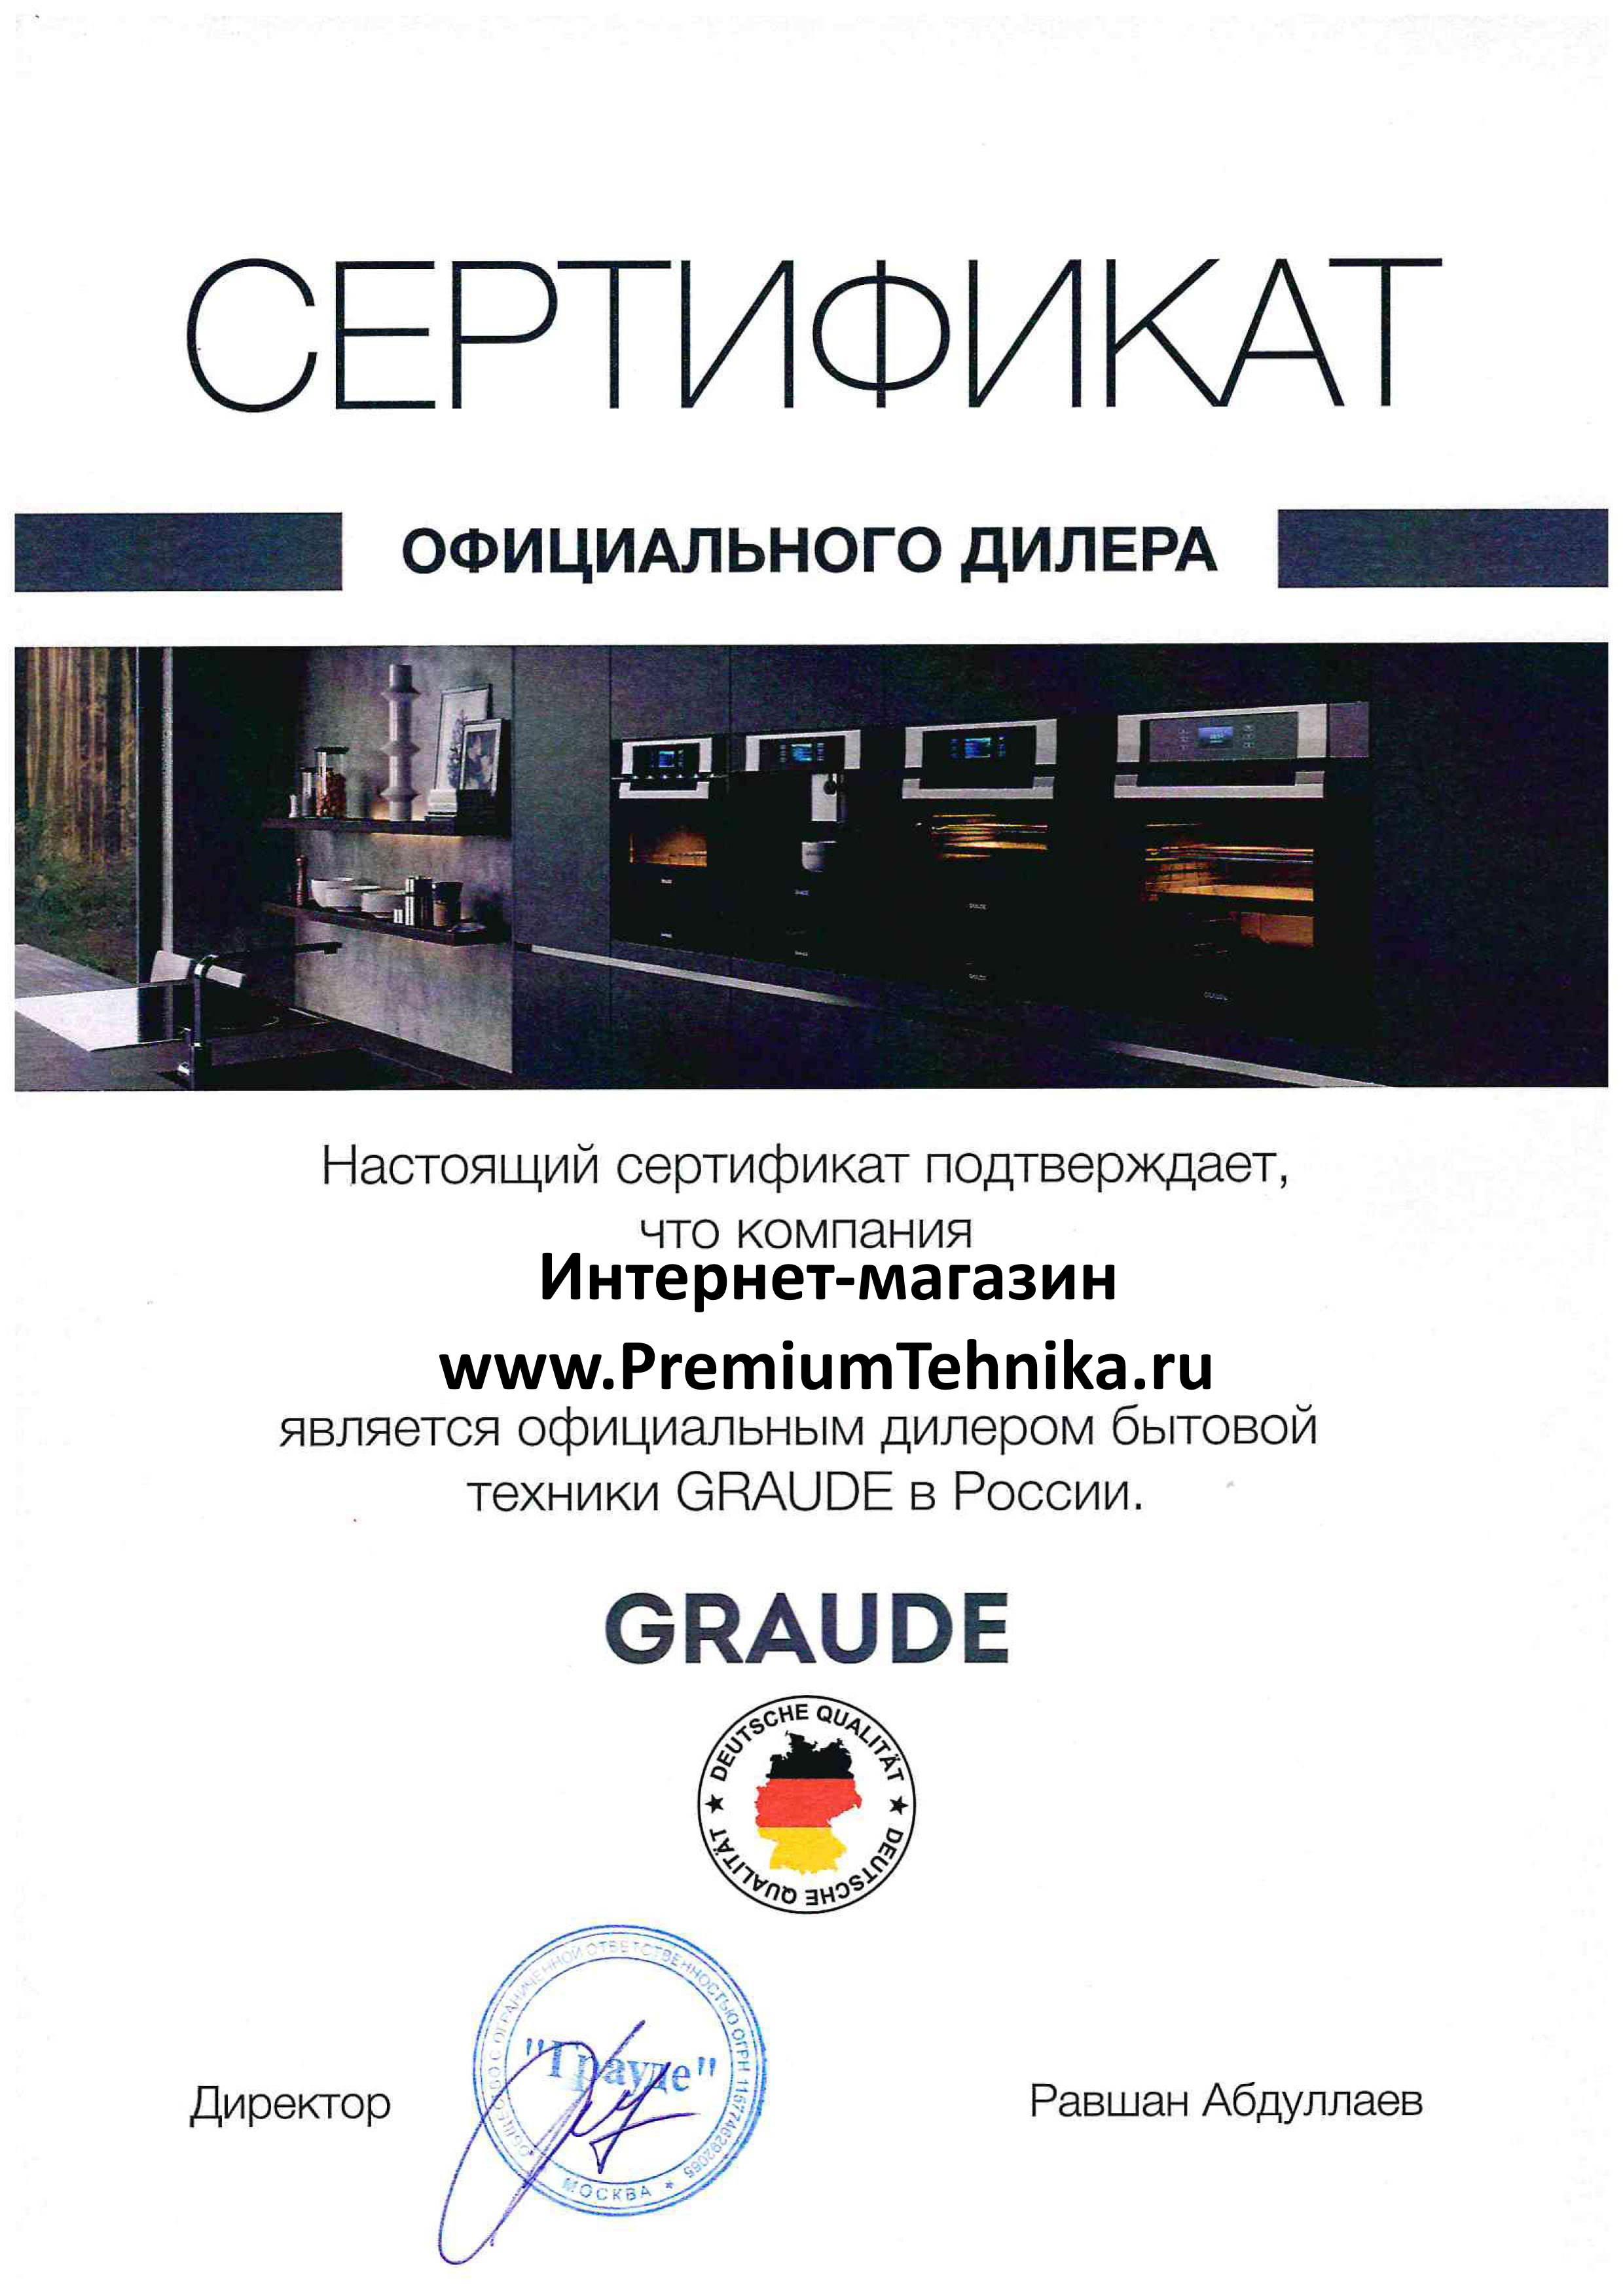 GRAUDE certificate